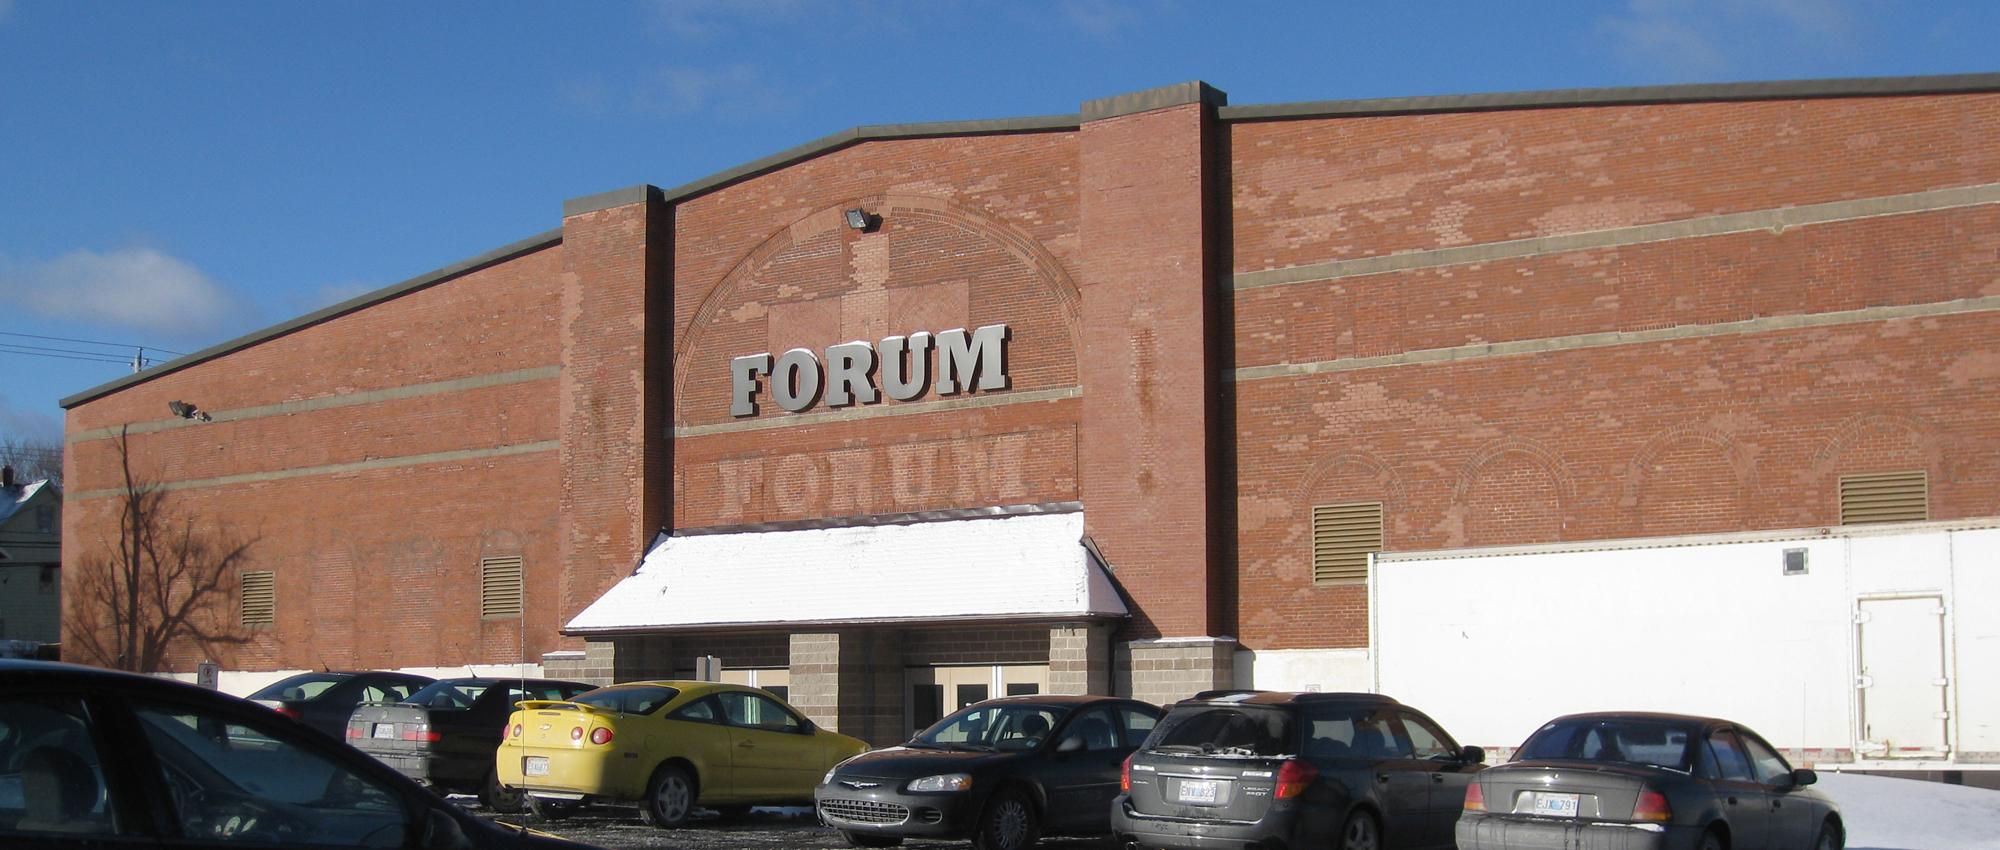 Ns Forum